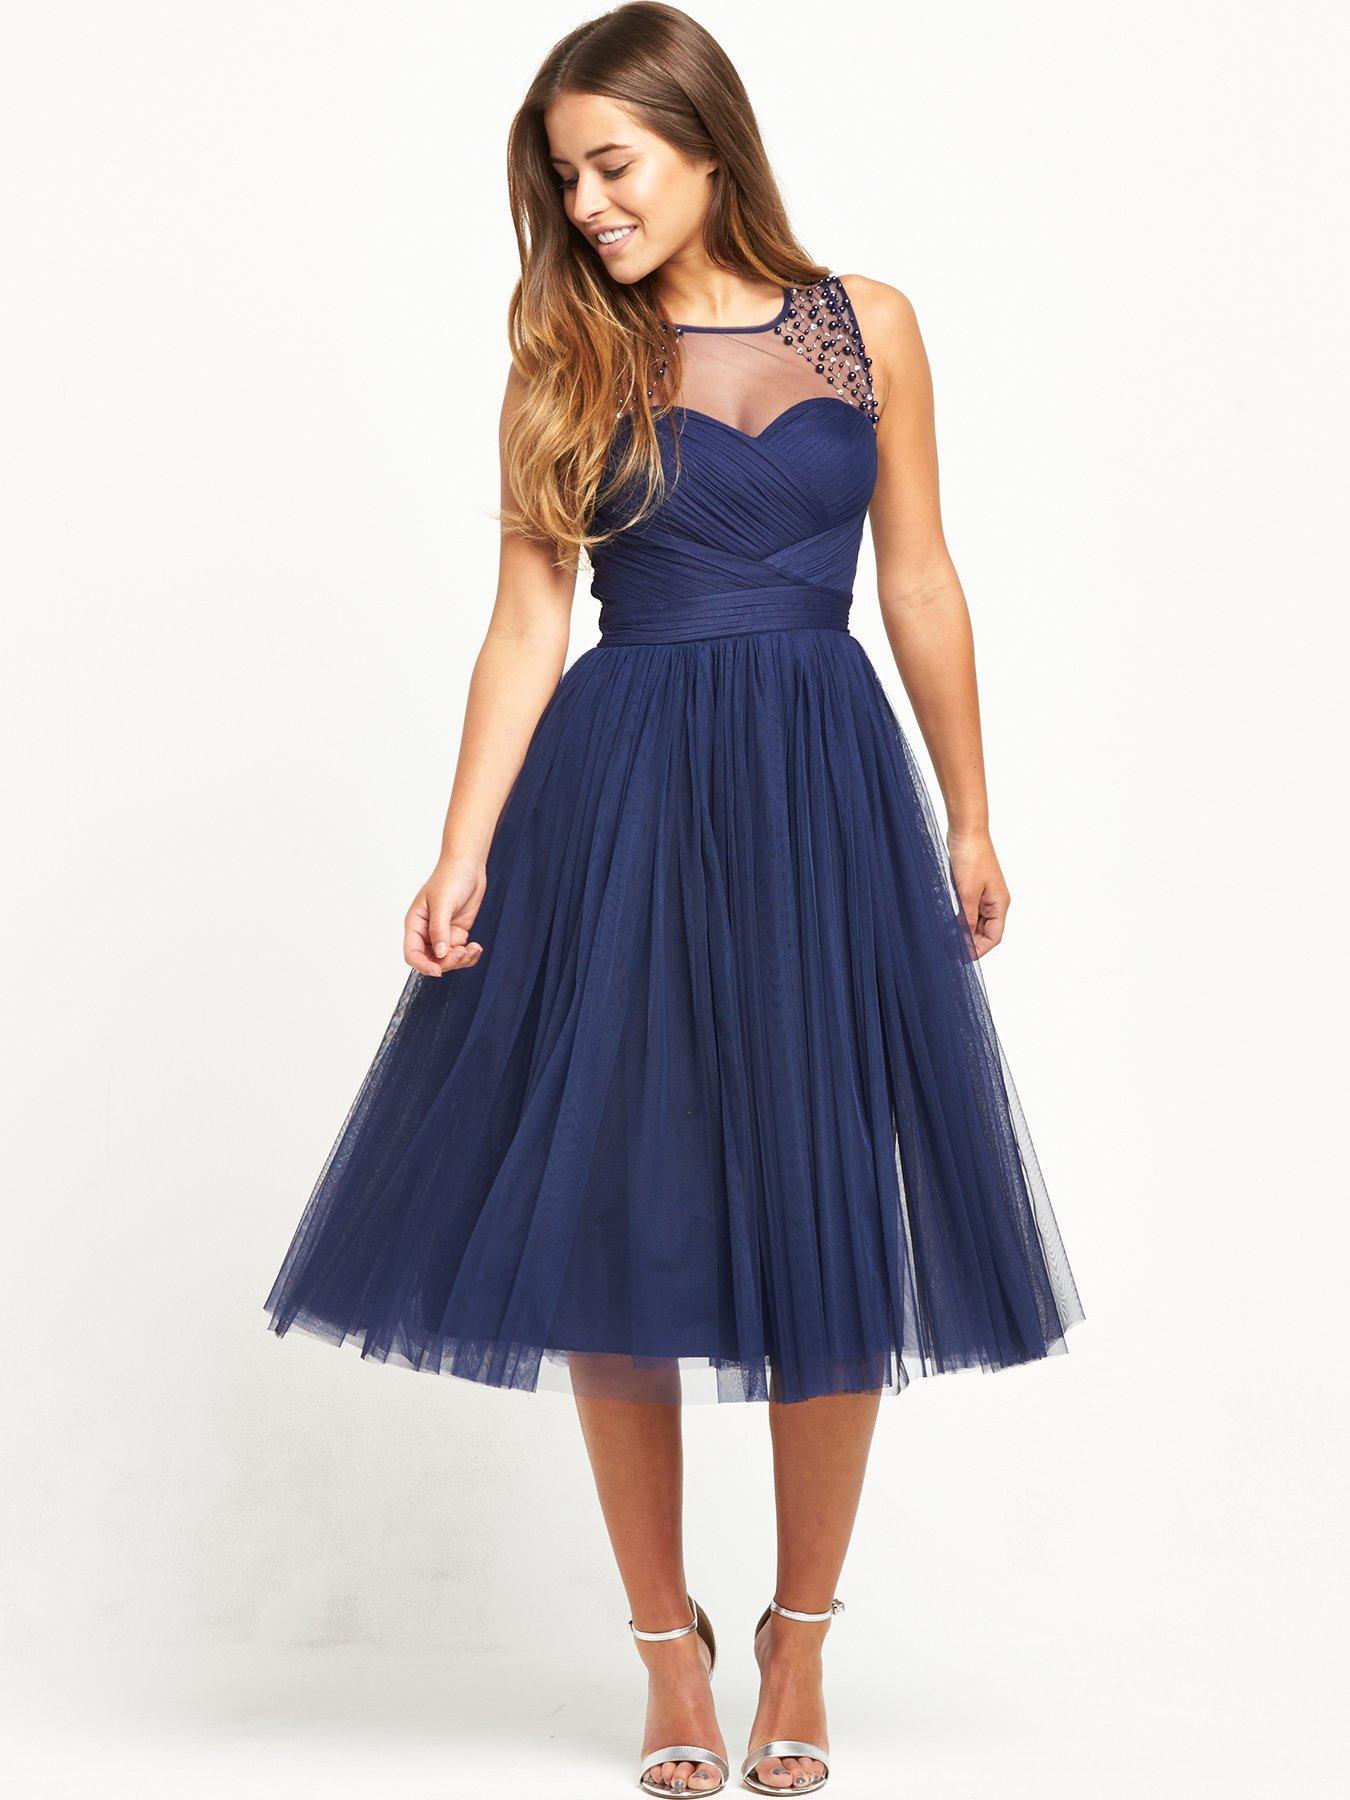 Cocktail Dresses UK